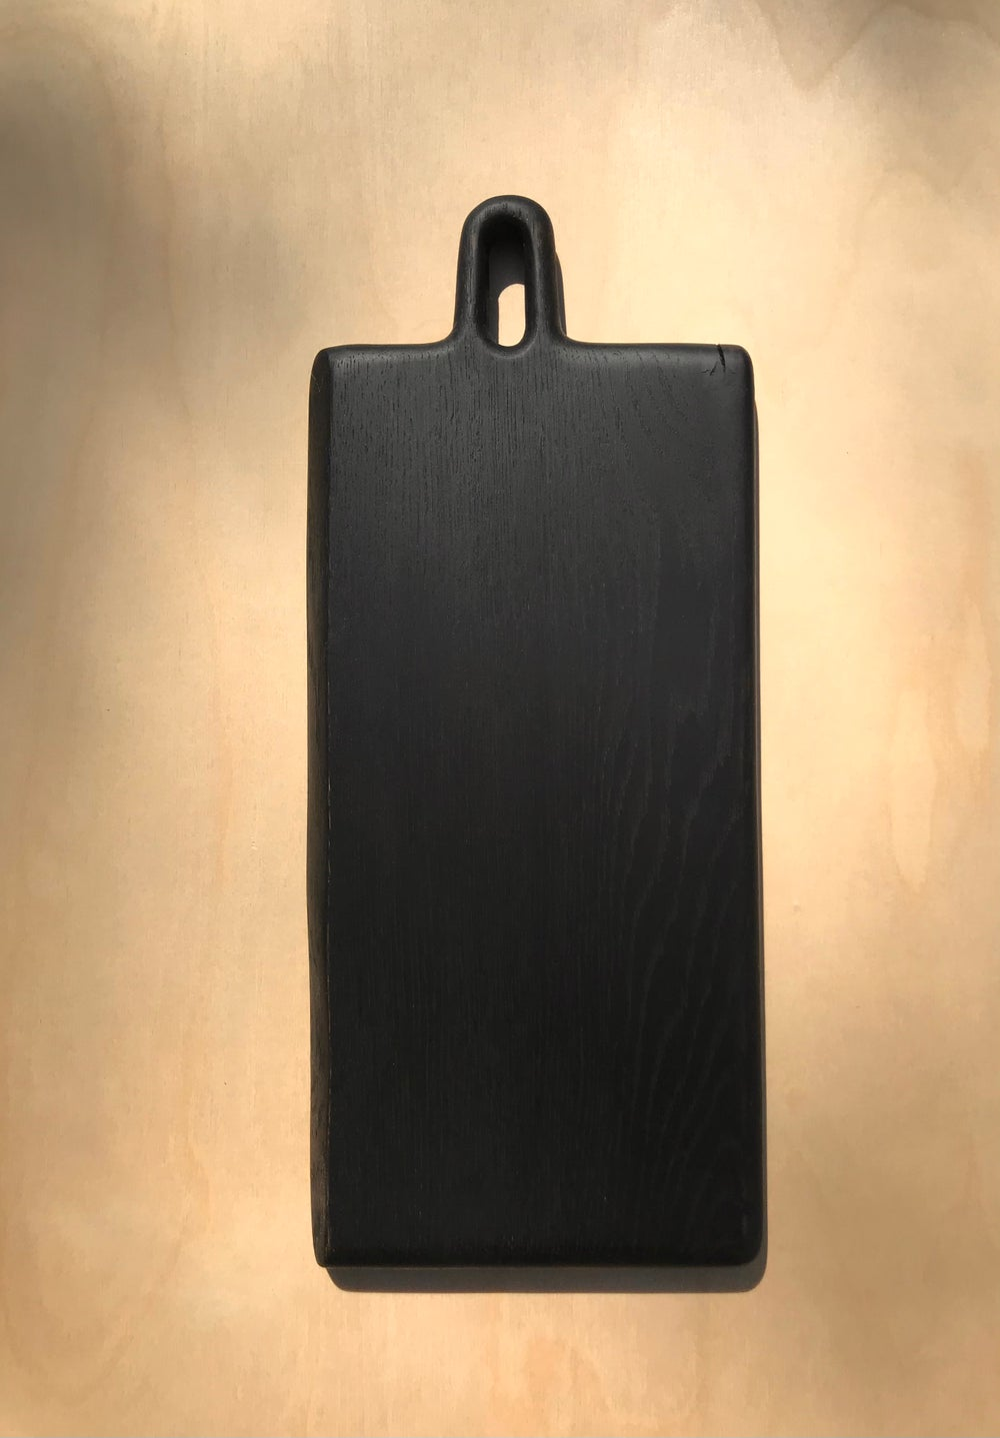 Image of planche #1 en chêne noirci